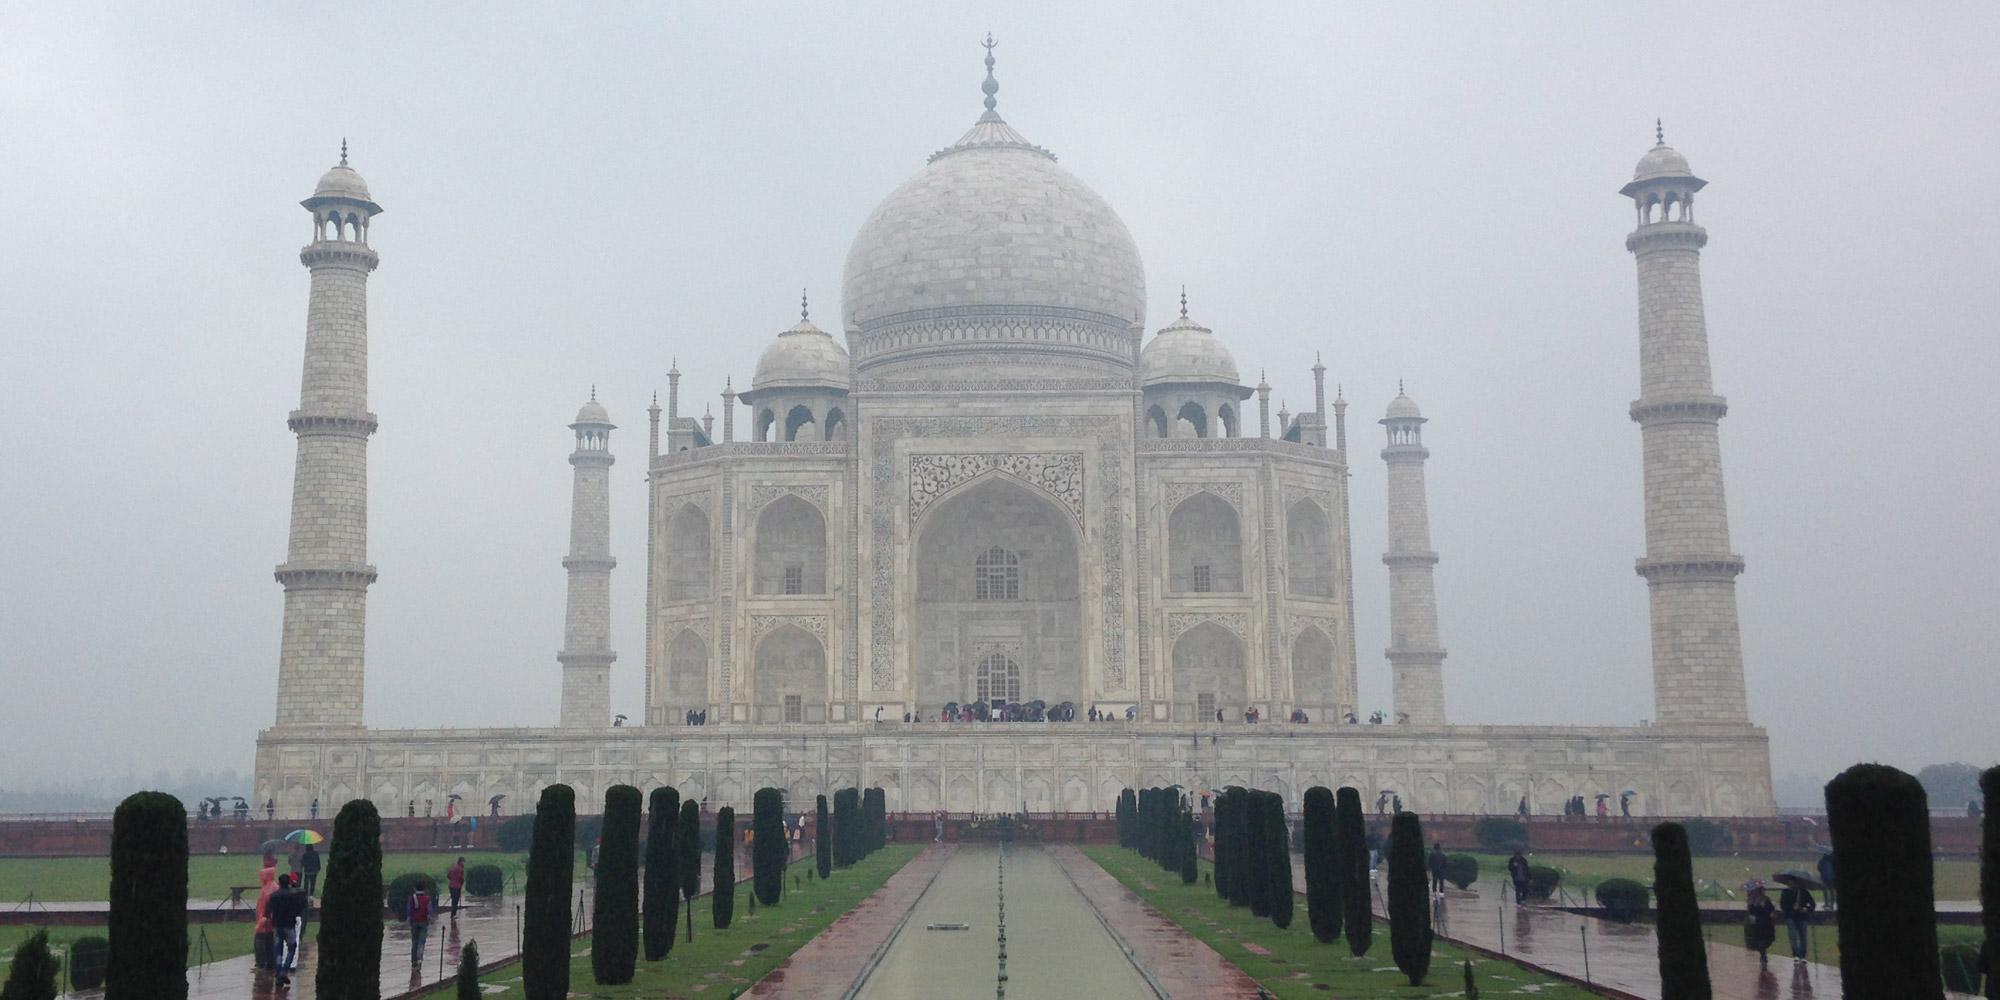 Taj mahal entrance centered